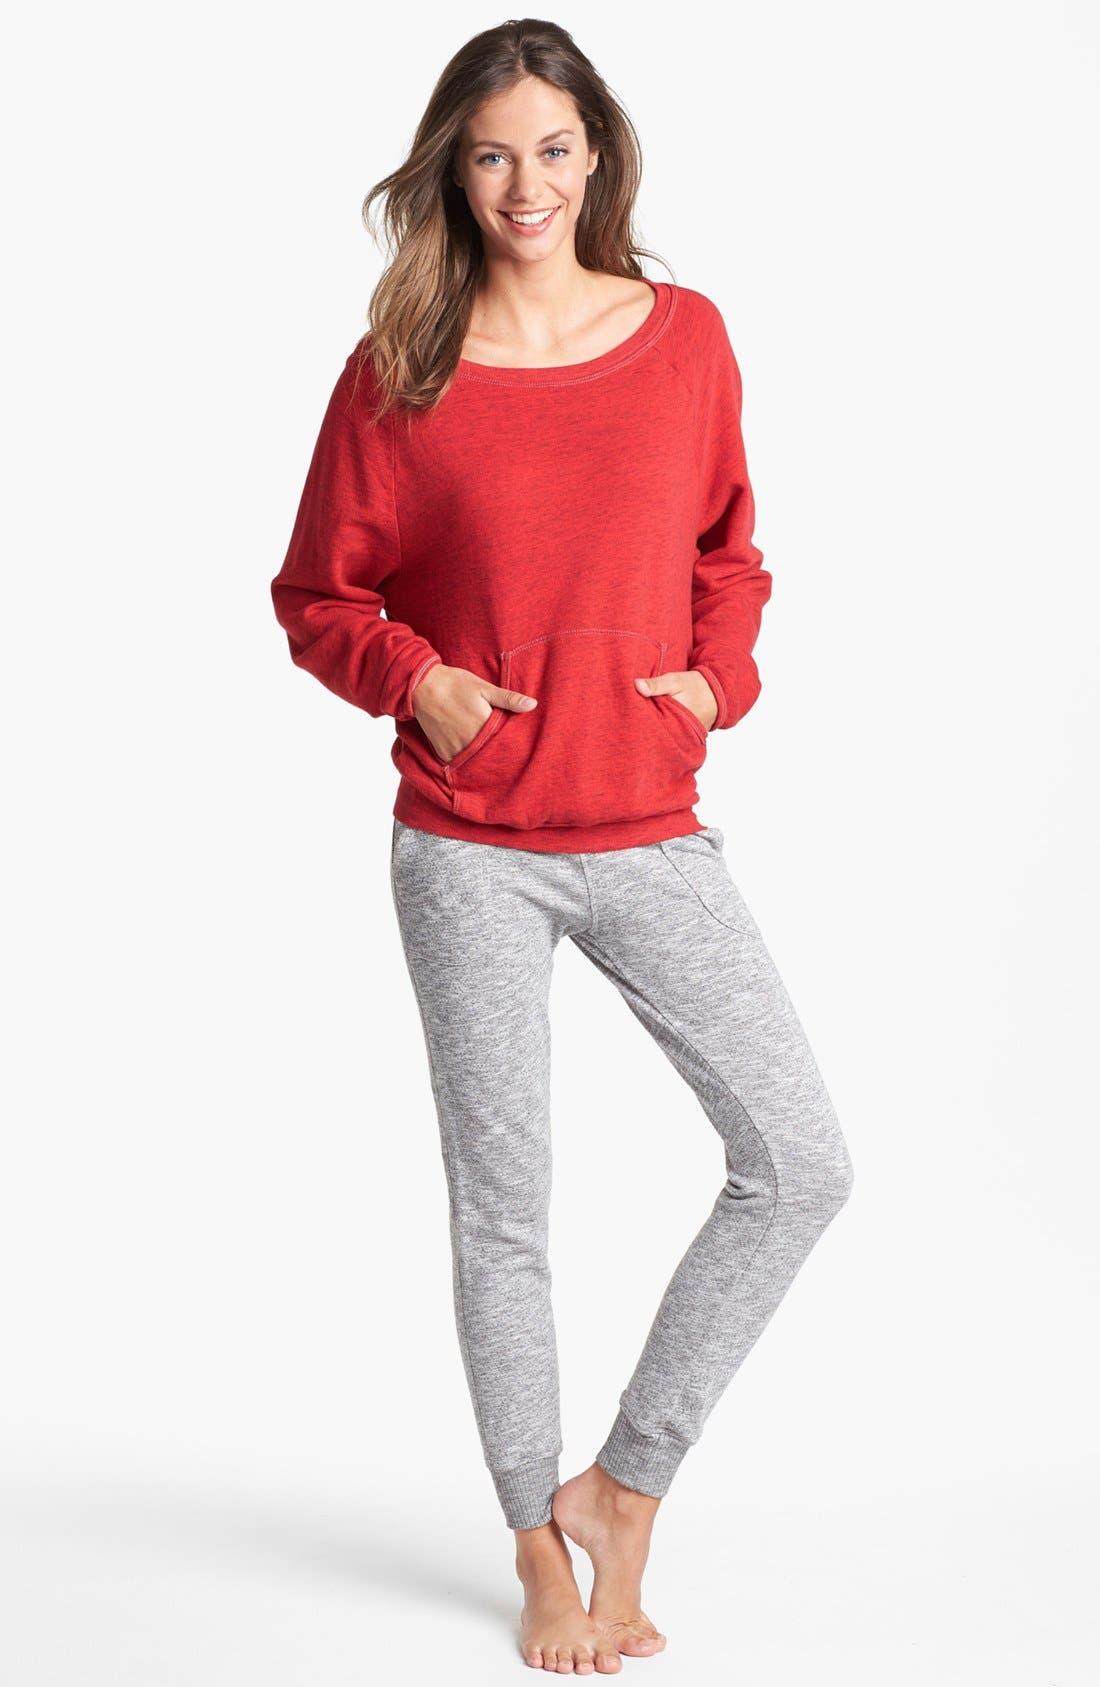 Alternate Image 1 Selected - Hard Tail Sweatshirt & Ankle Pants